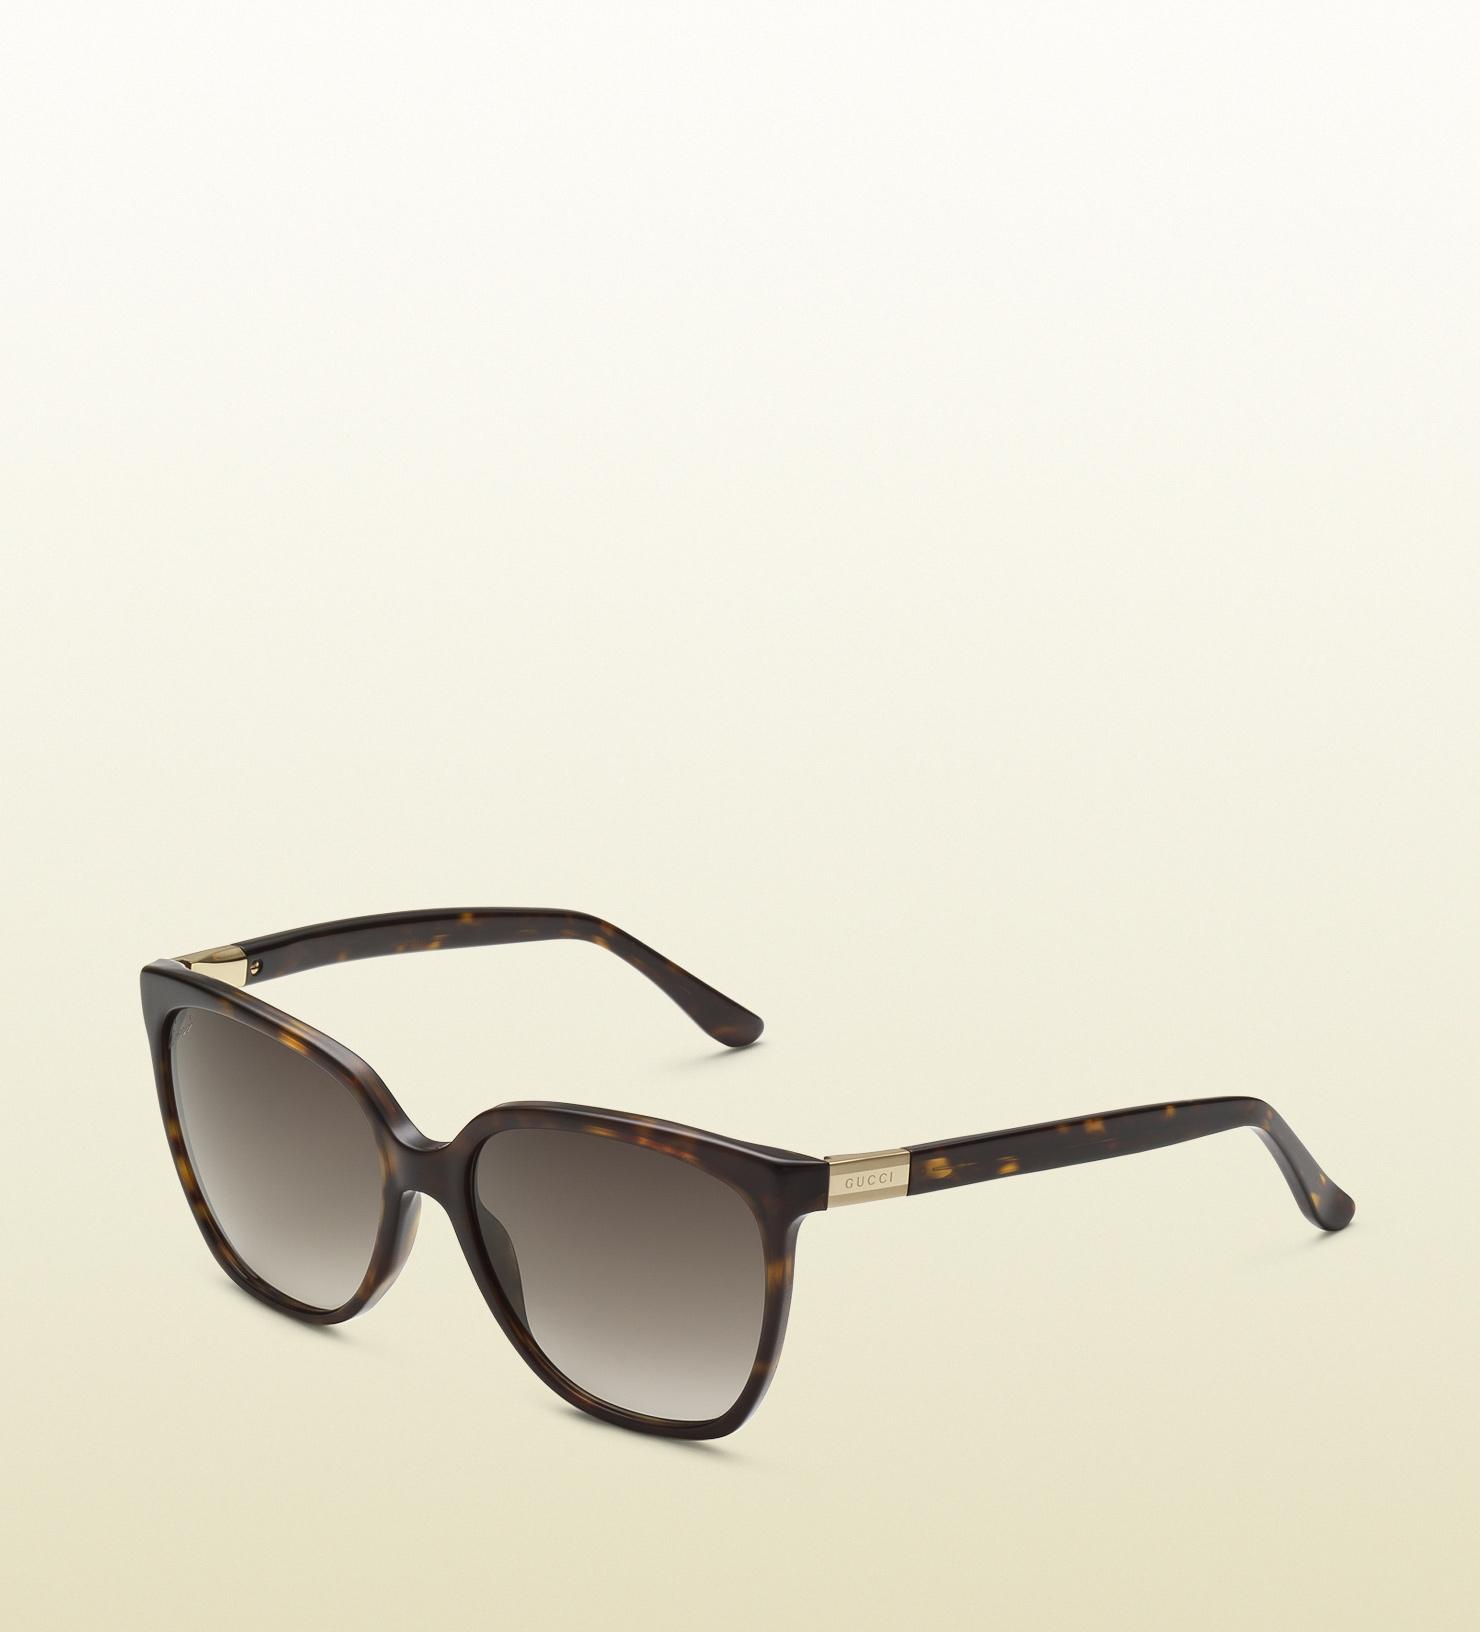 2884c00bd5 Lyst - Gucci Womens Biobased Square Sunglasses in Black